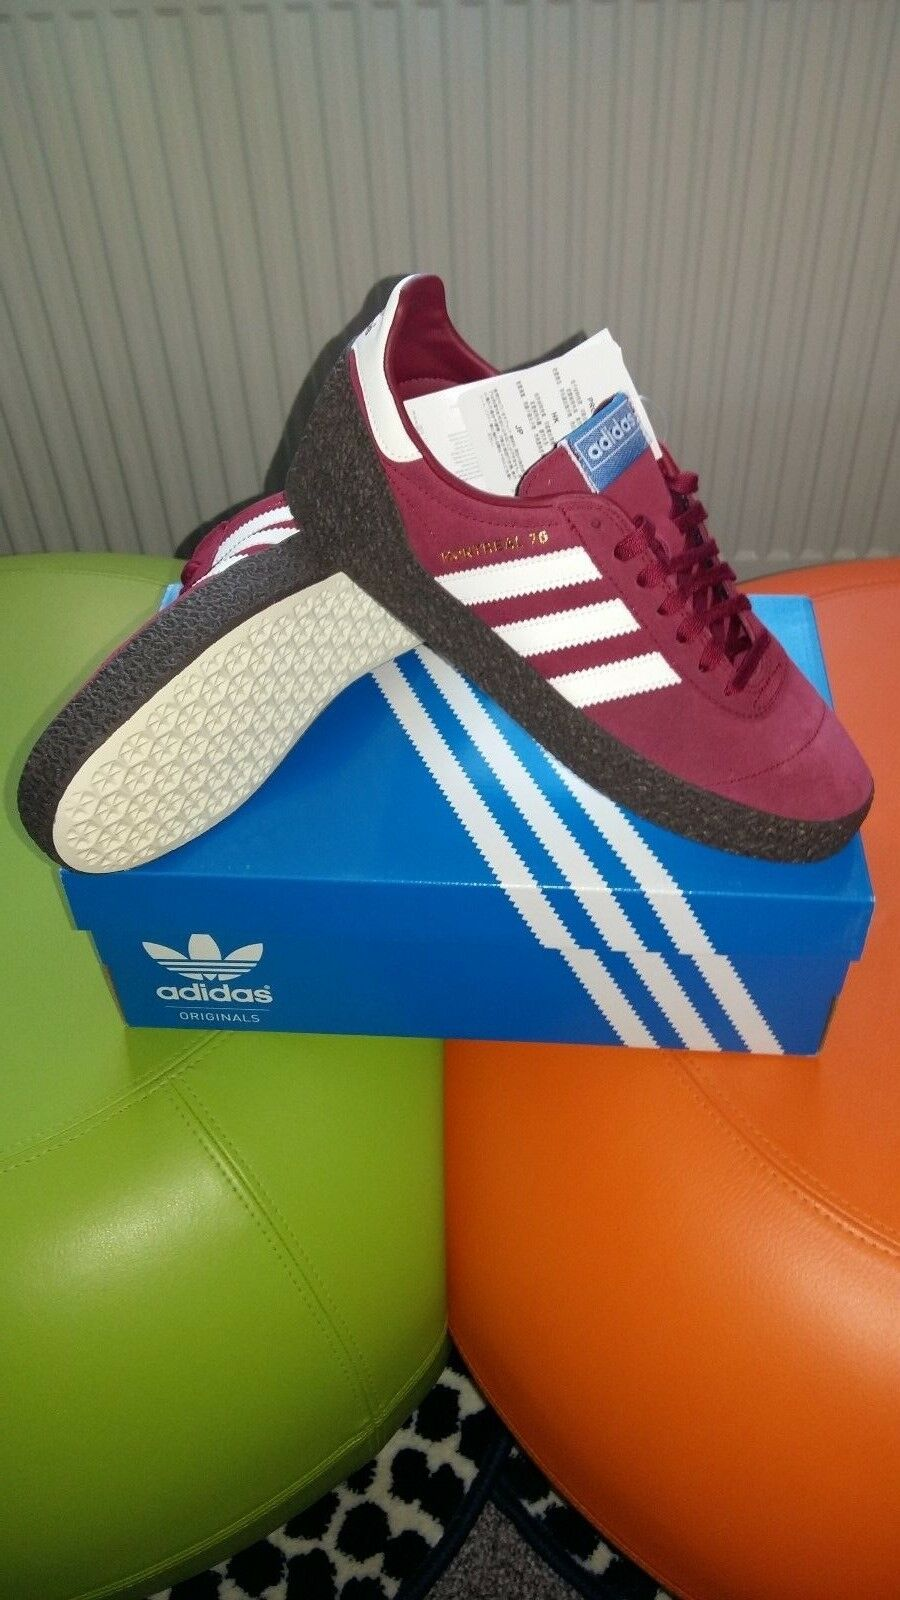 Adidas Montreal 76  originals.. Terrace classics..trainers size 10 uk eur 44 2 3